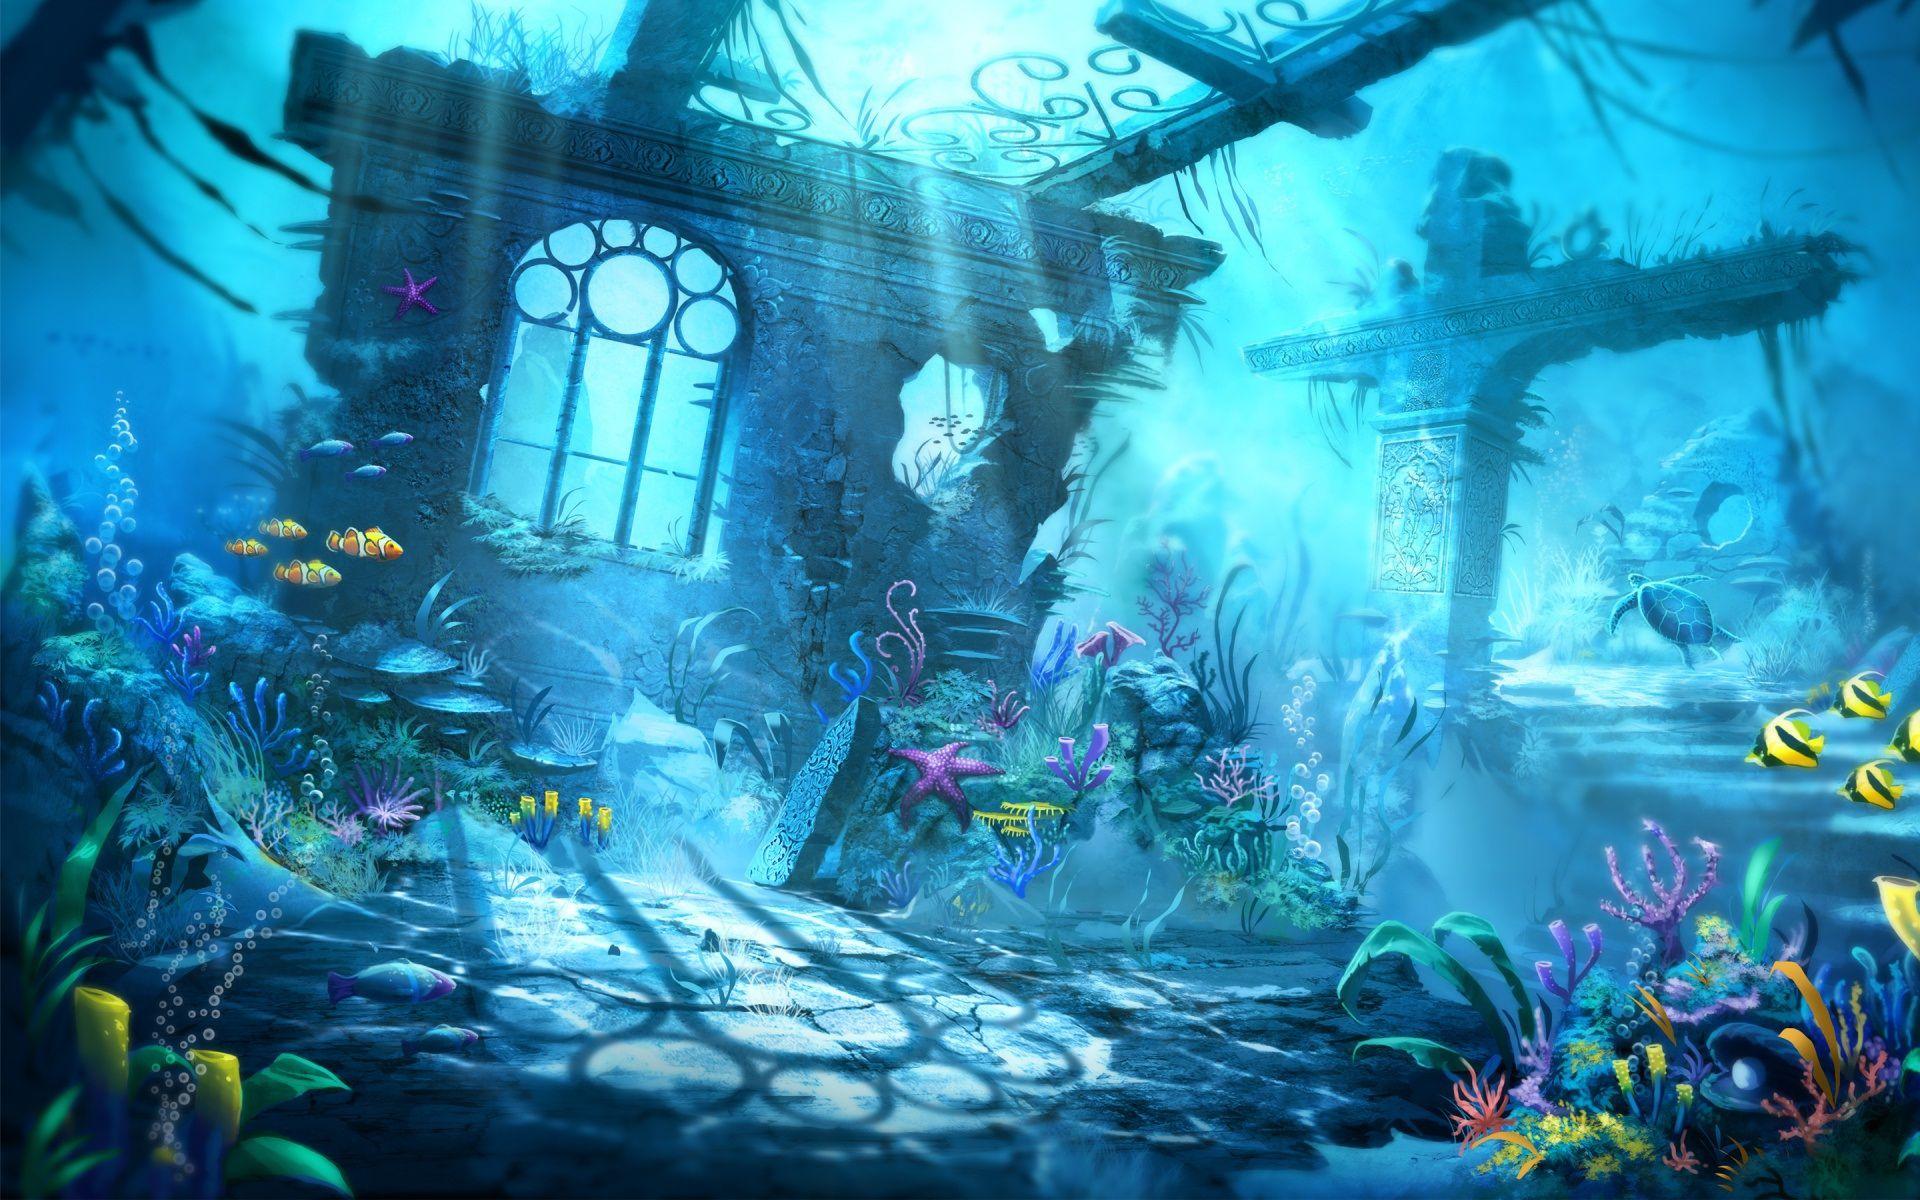 Life under water essay